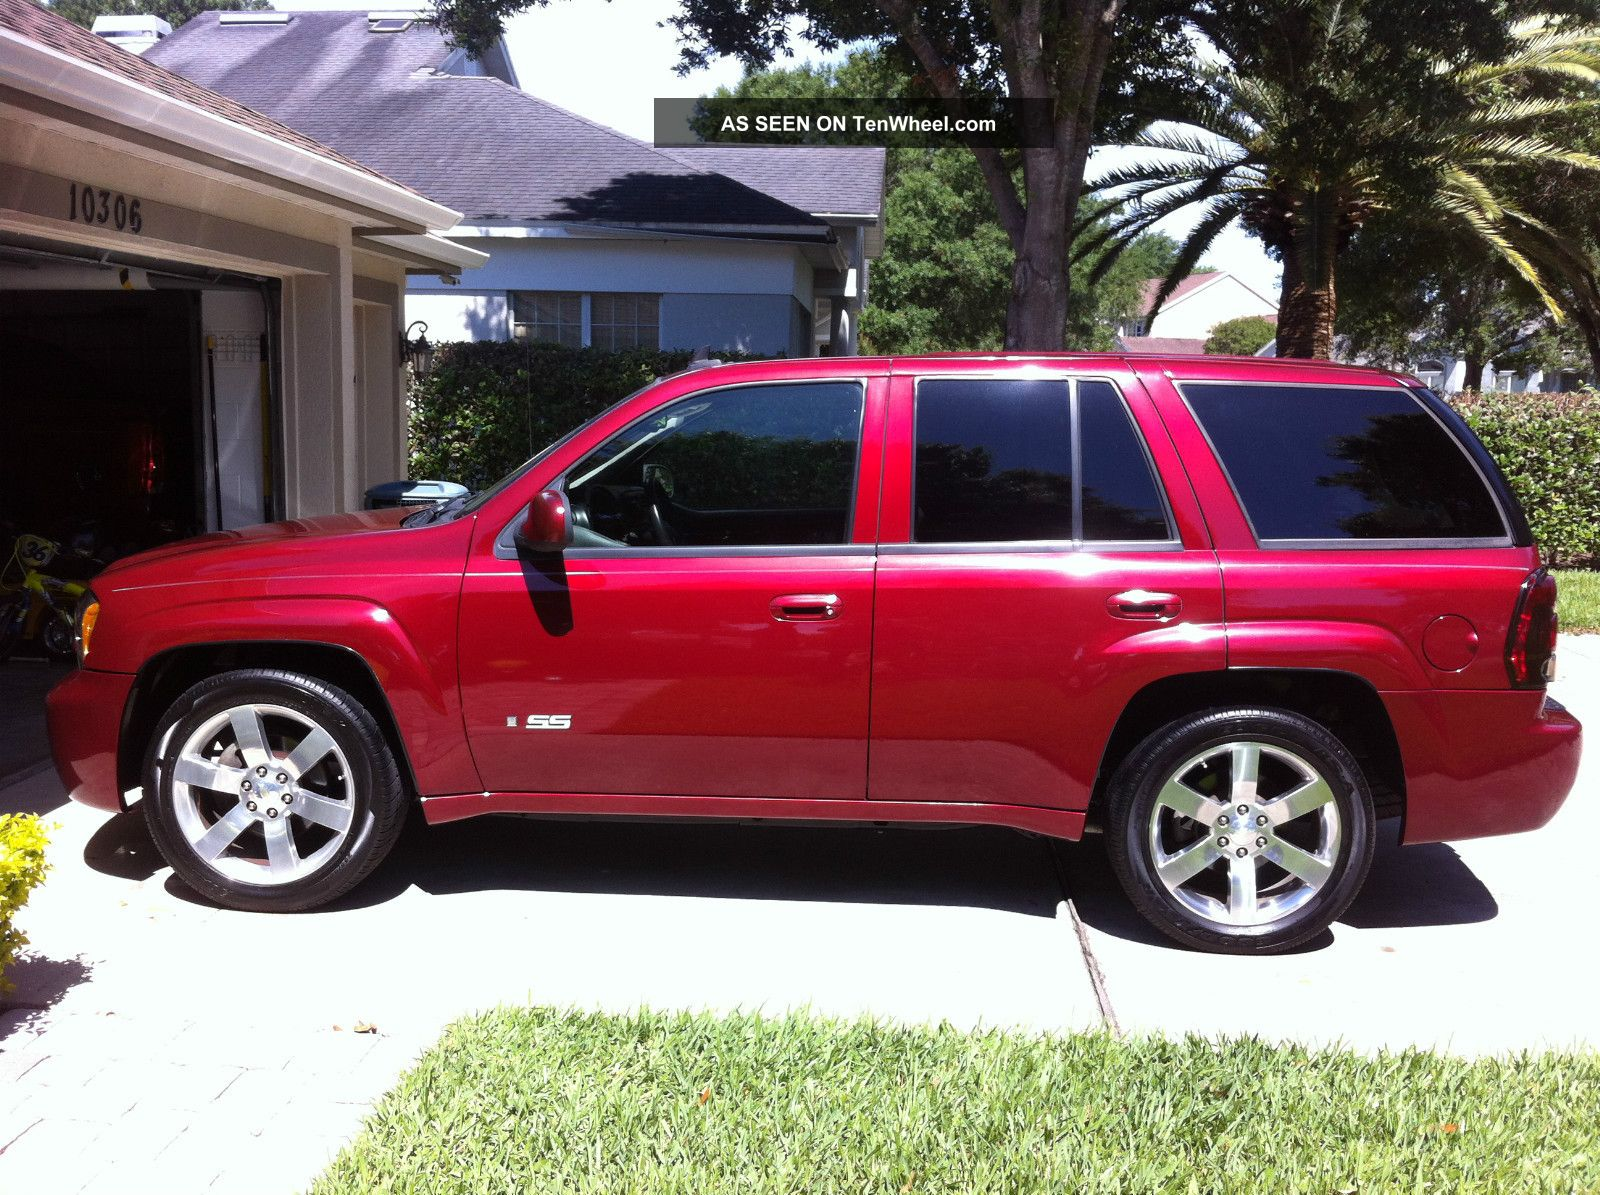 2007 Chevrolet Trailblazer Ss 6 0l Ls2 Corolla Fuel Filter Location